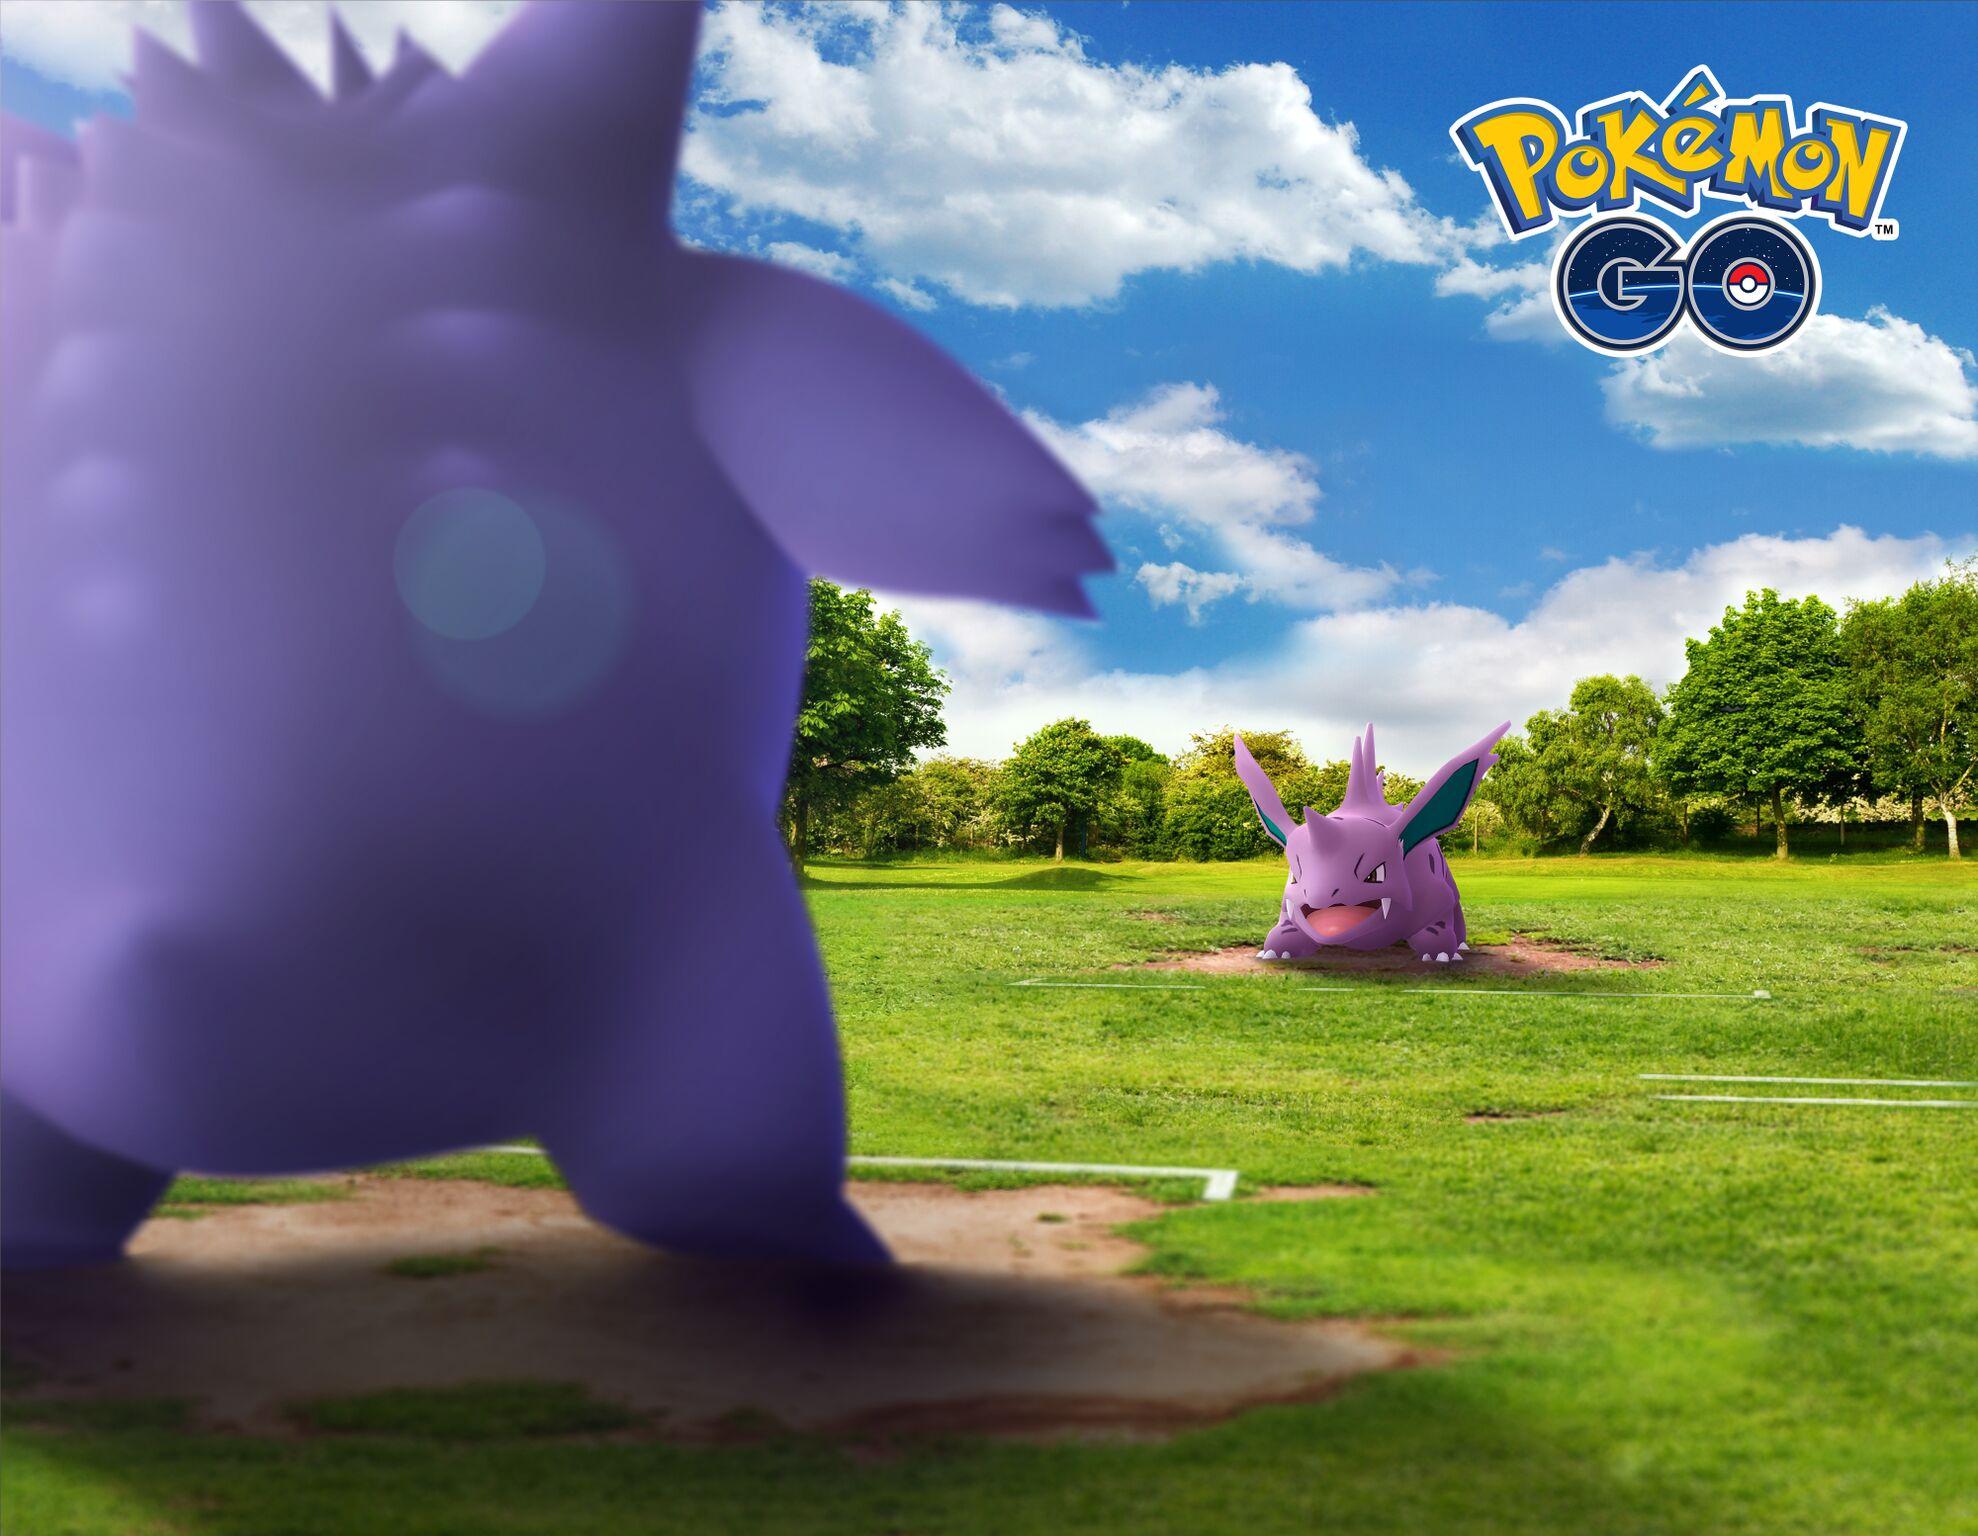 venturebeat.com - Jeff Grubb - Pokémon Go dev raises $245 million in funding